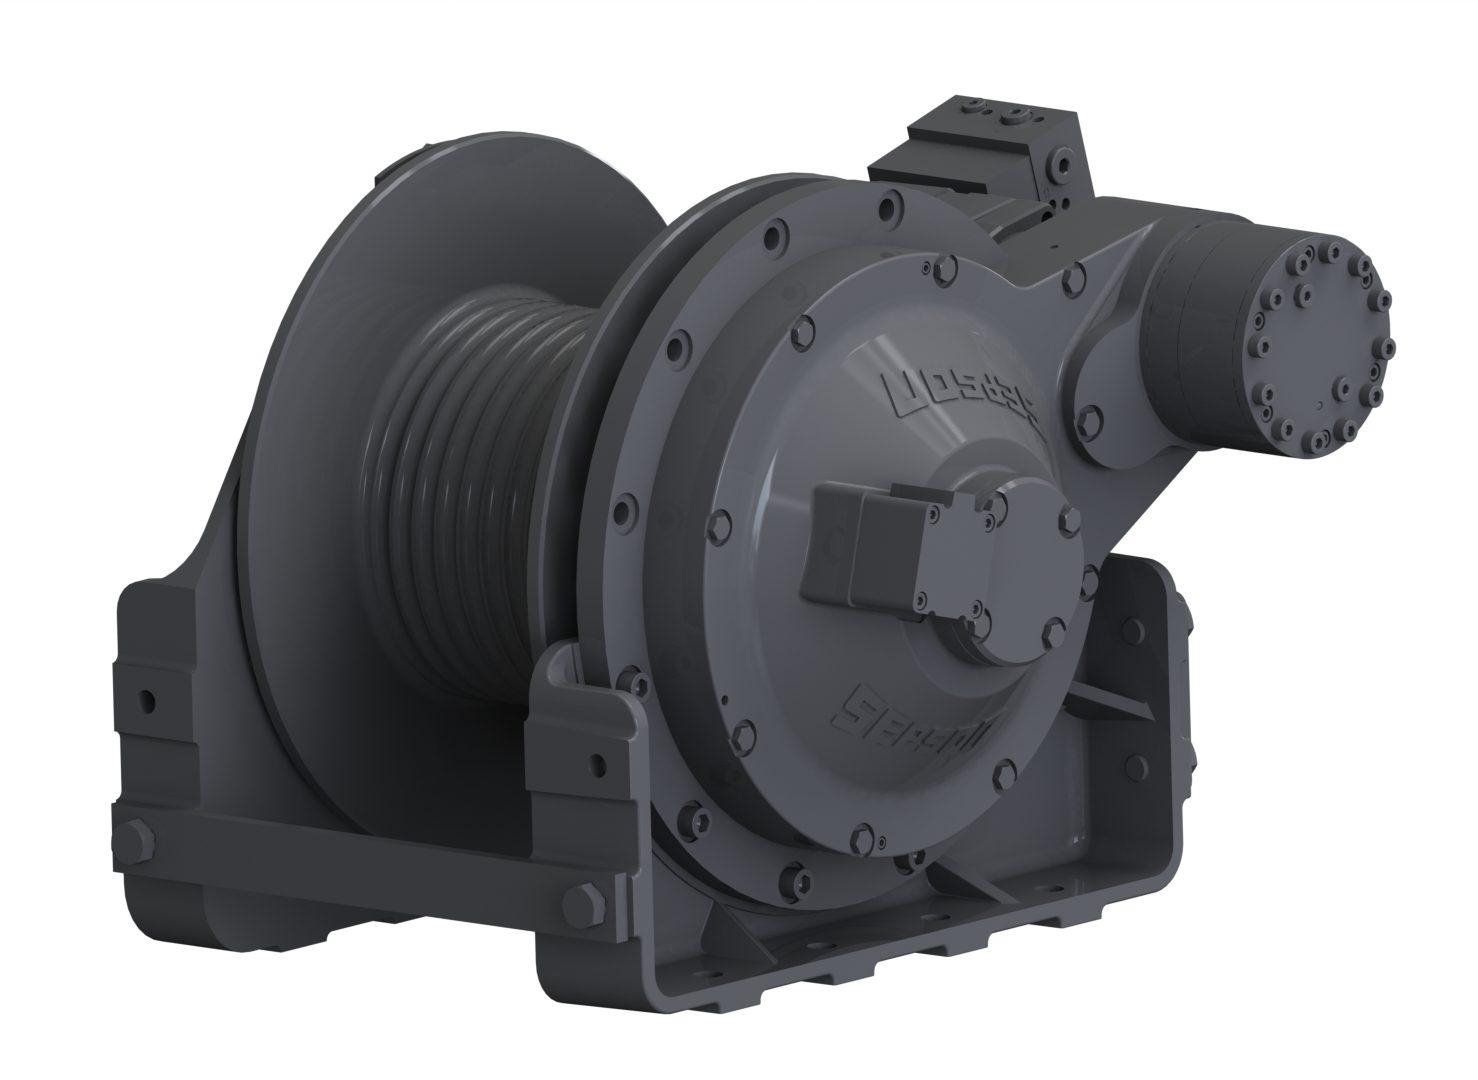 Sepdurance H100F - H120F